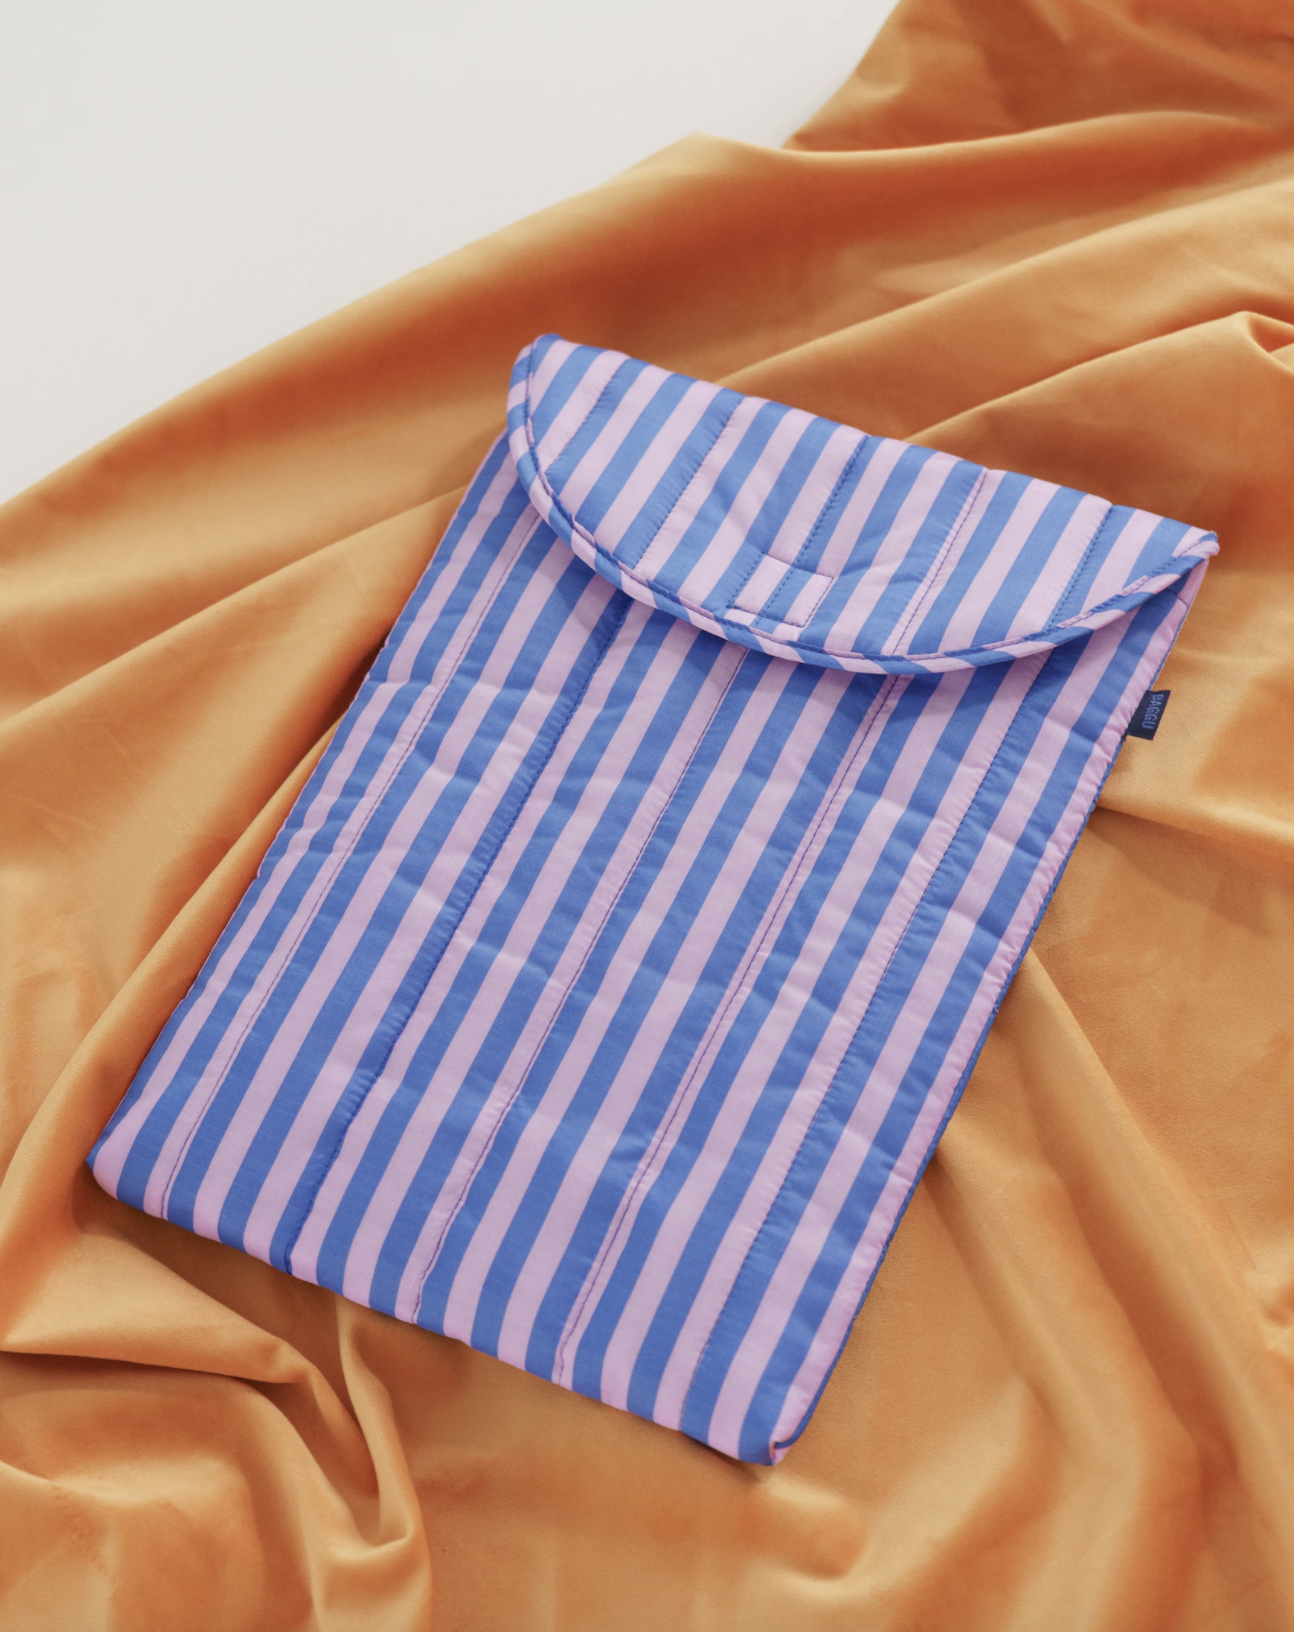 "BAGGU - Puffy Laptop Sleeve 13"", Pink and blue stripe"